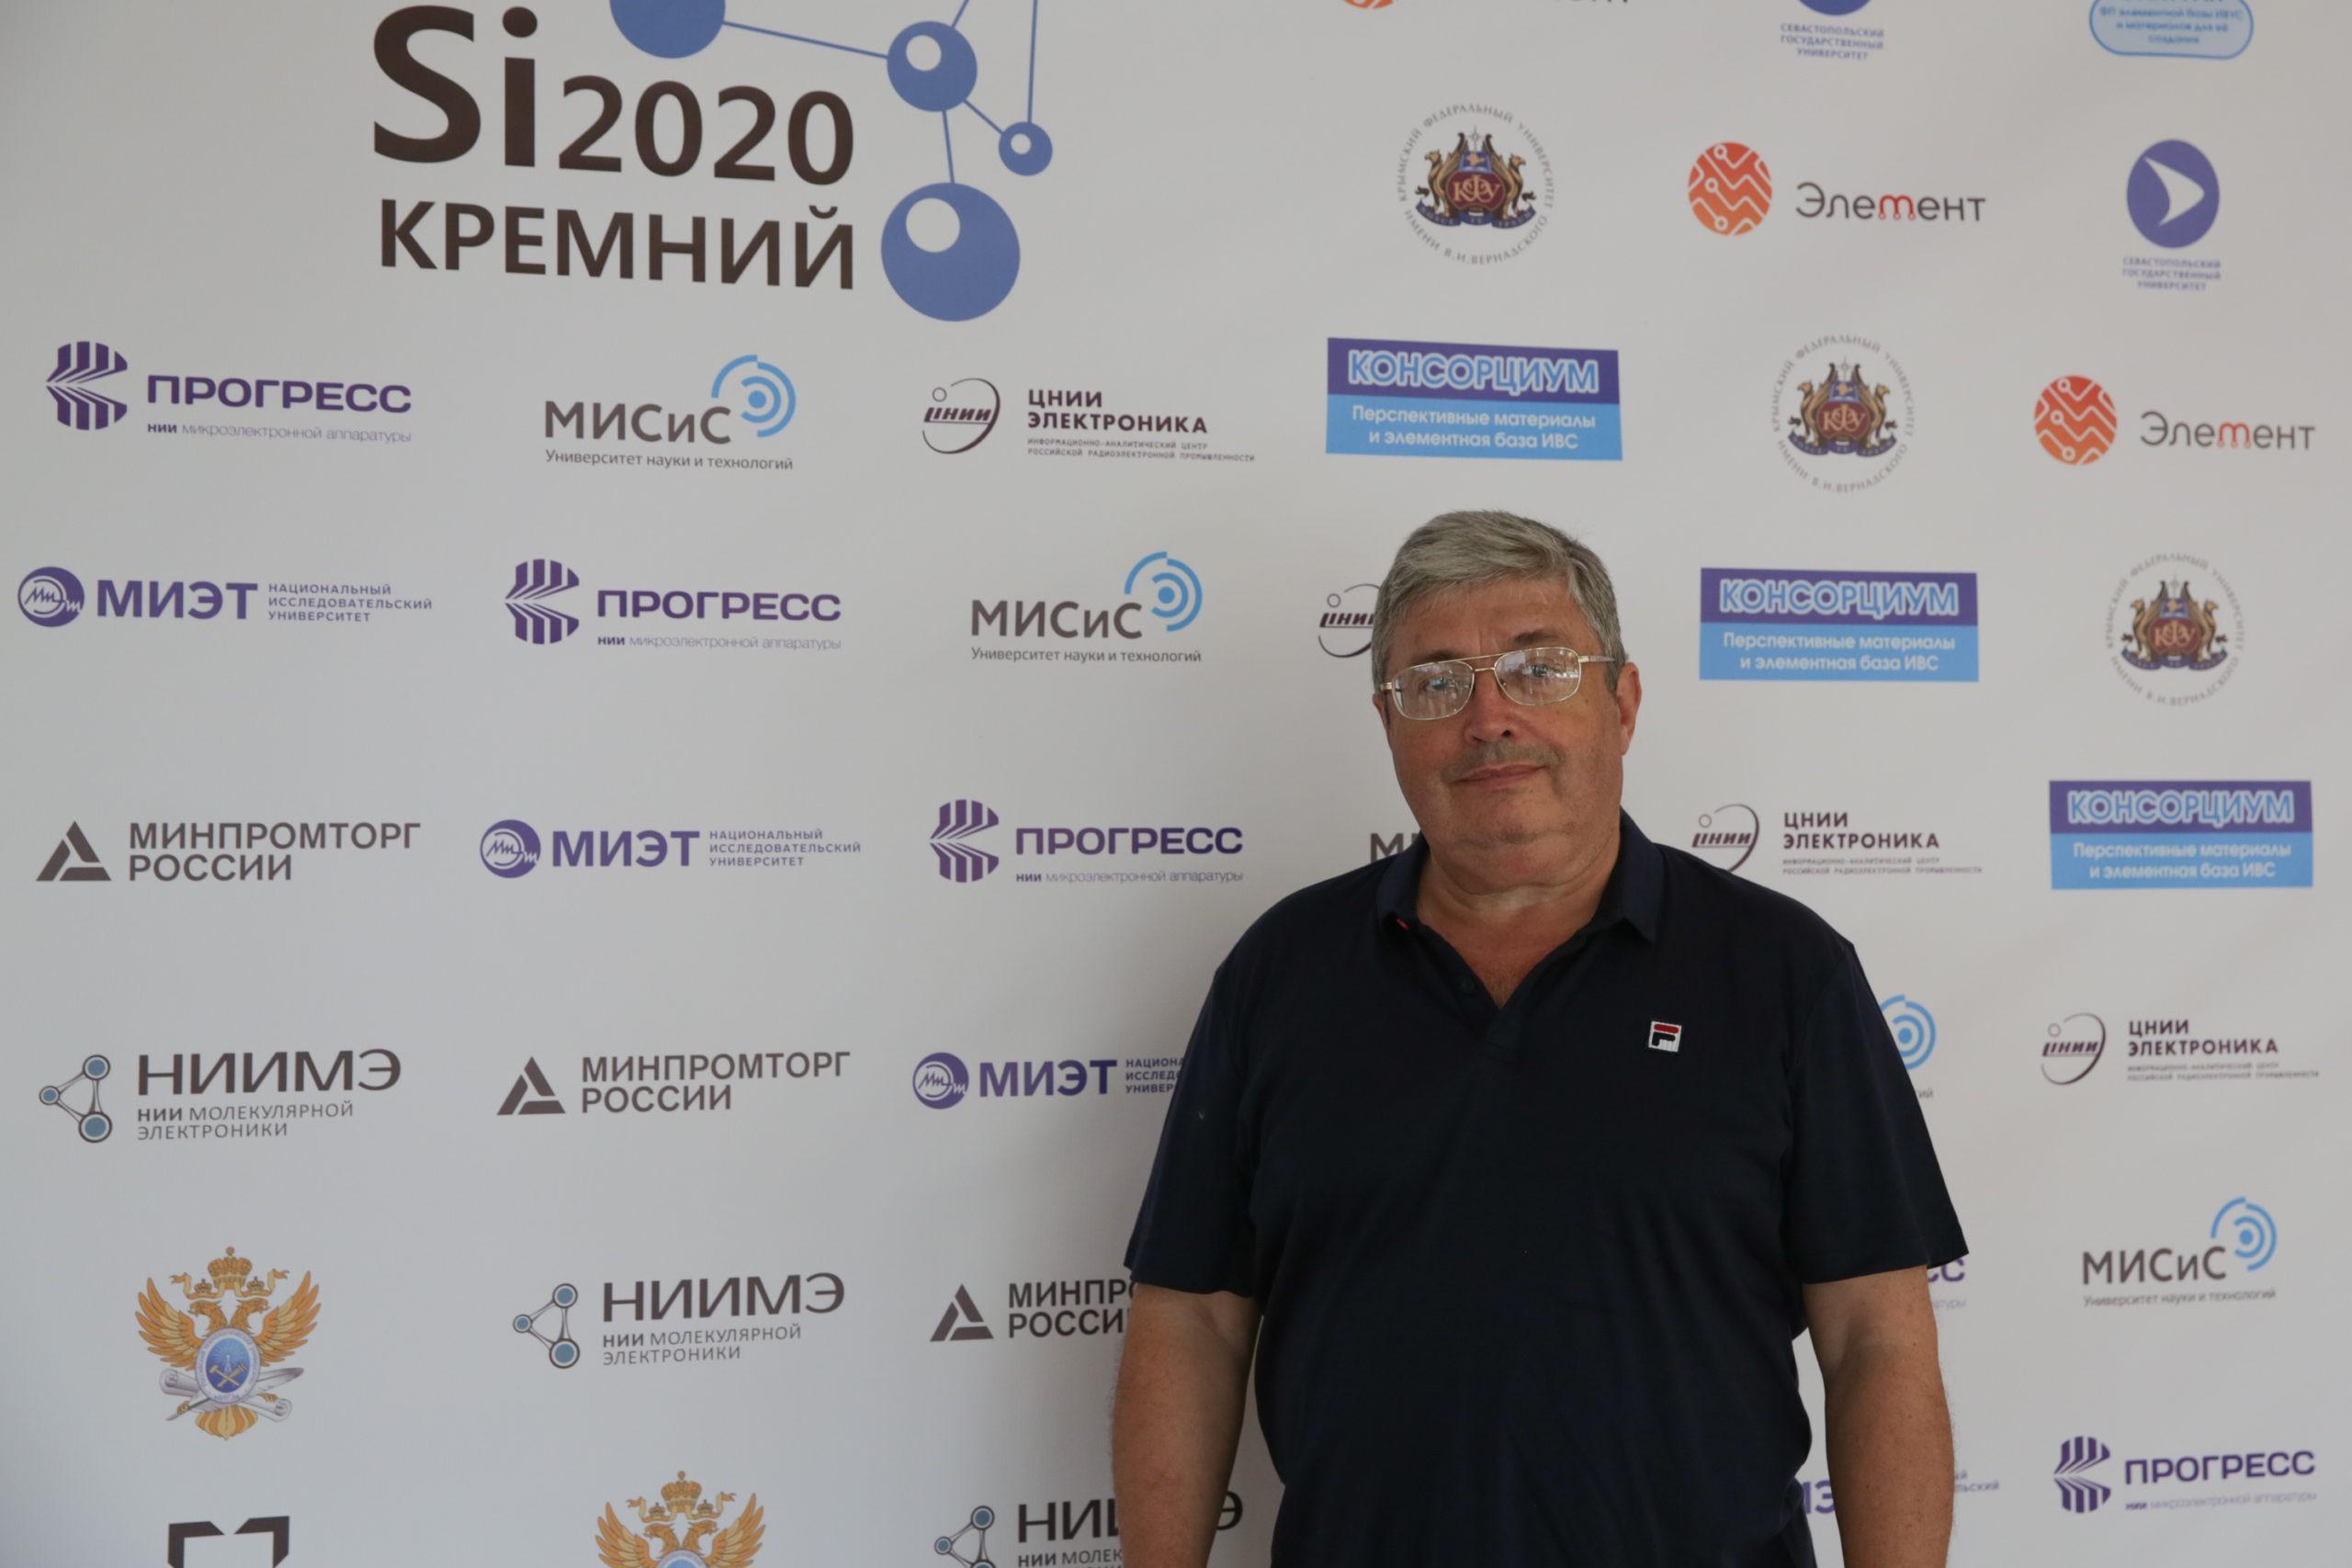 Сотрудник ОКБ «АСТРОН» Наумов Аркадий Валерьевич на конференции «Кремний-2020»